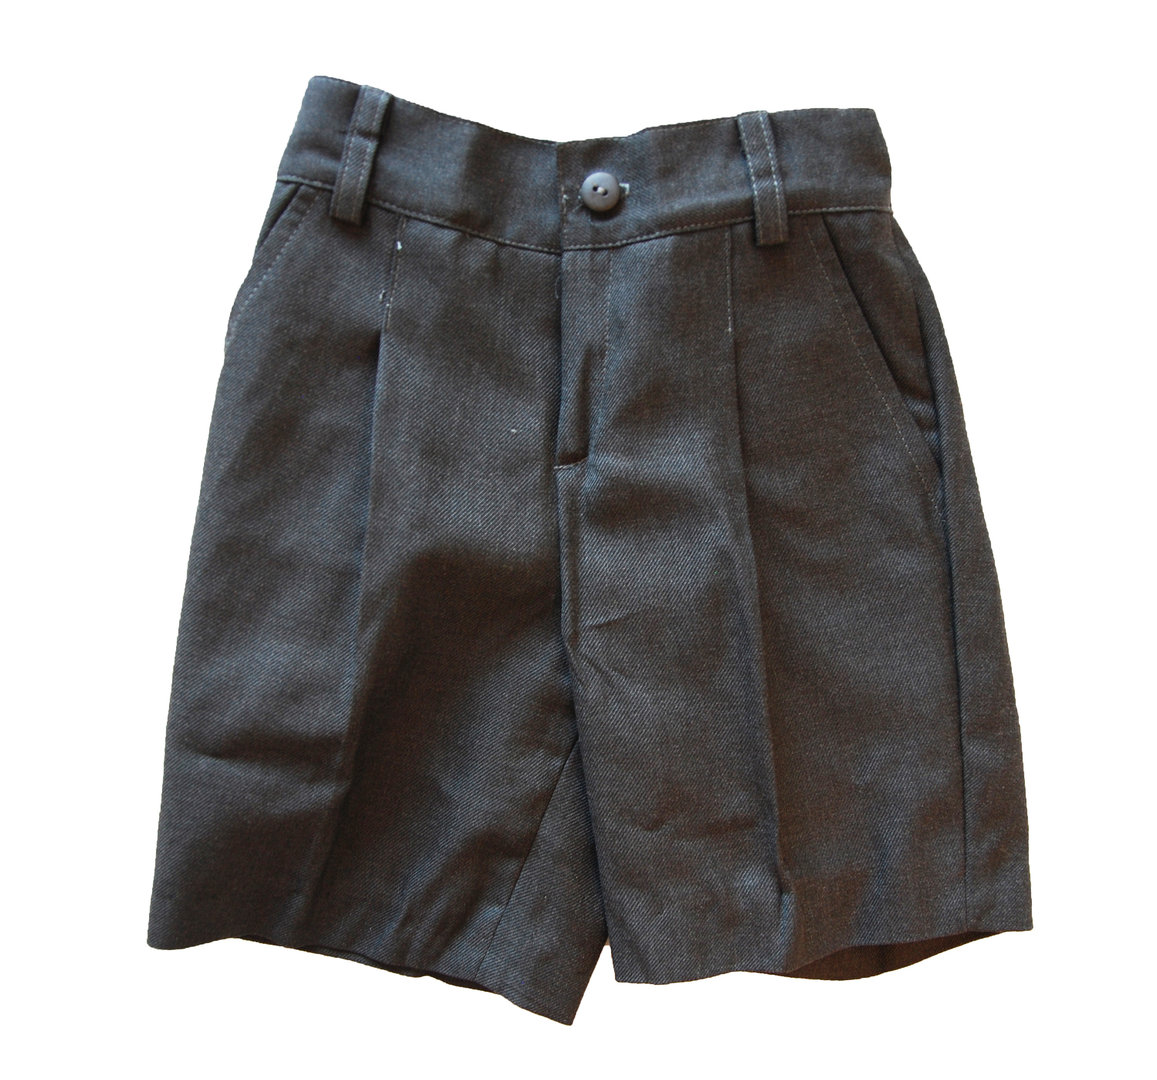 5dc8ad0ac788b Pantalón corto uniforme escolar - Unikids